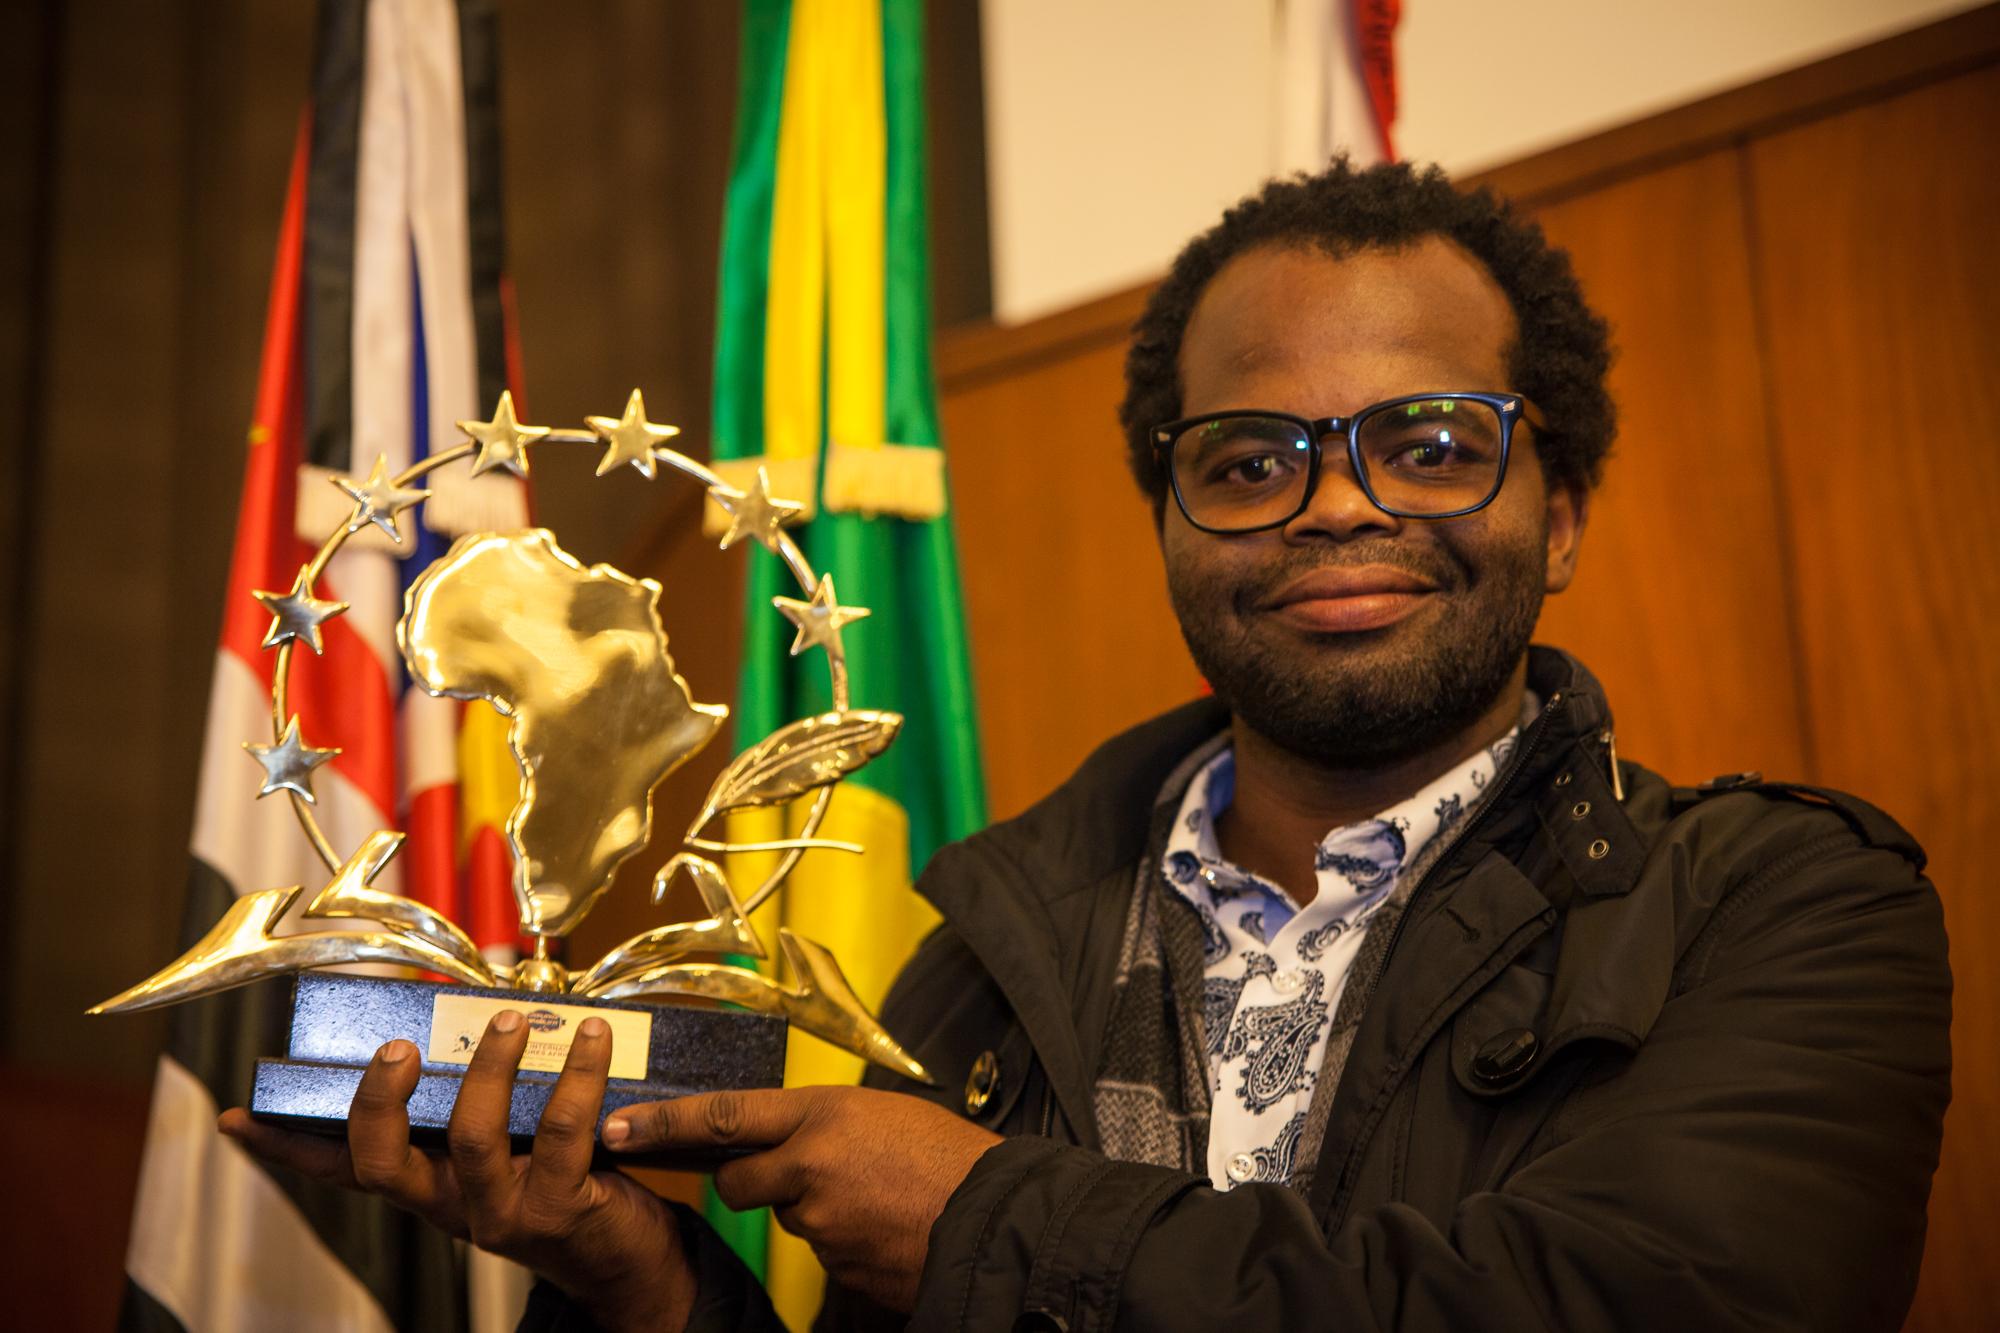 Palestrante Moçambicano, Pedro Pereira Lopes